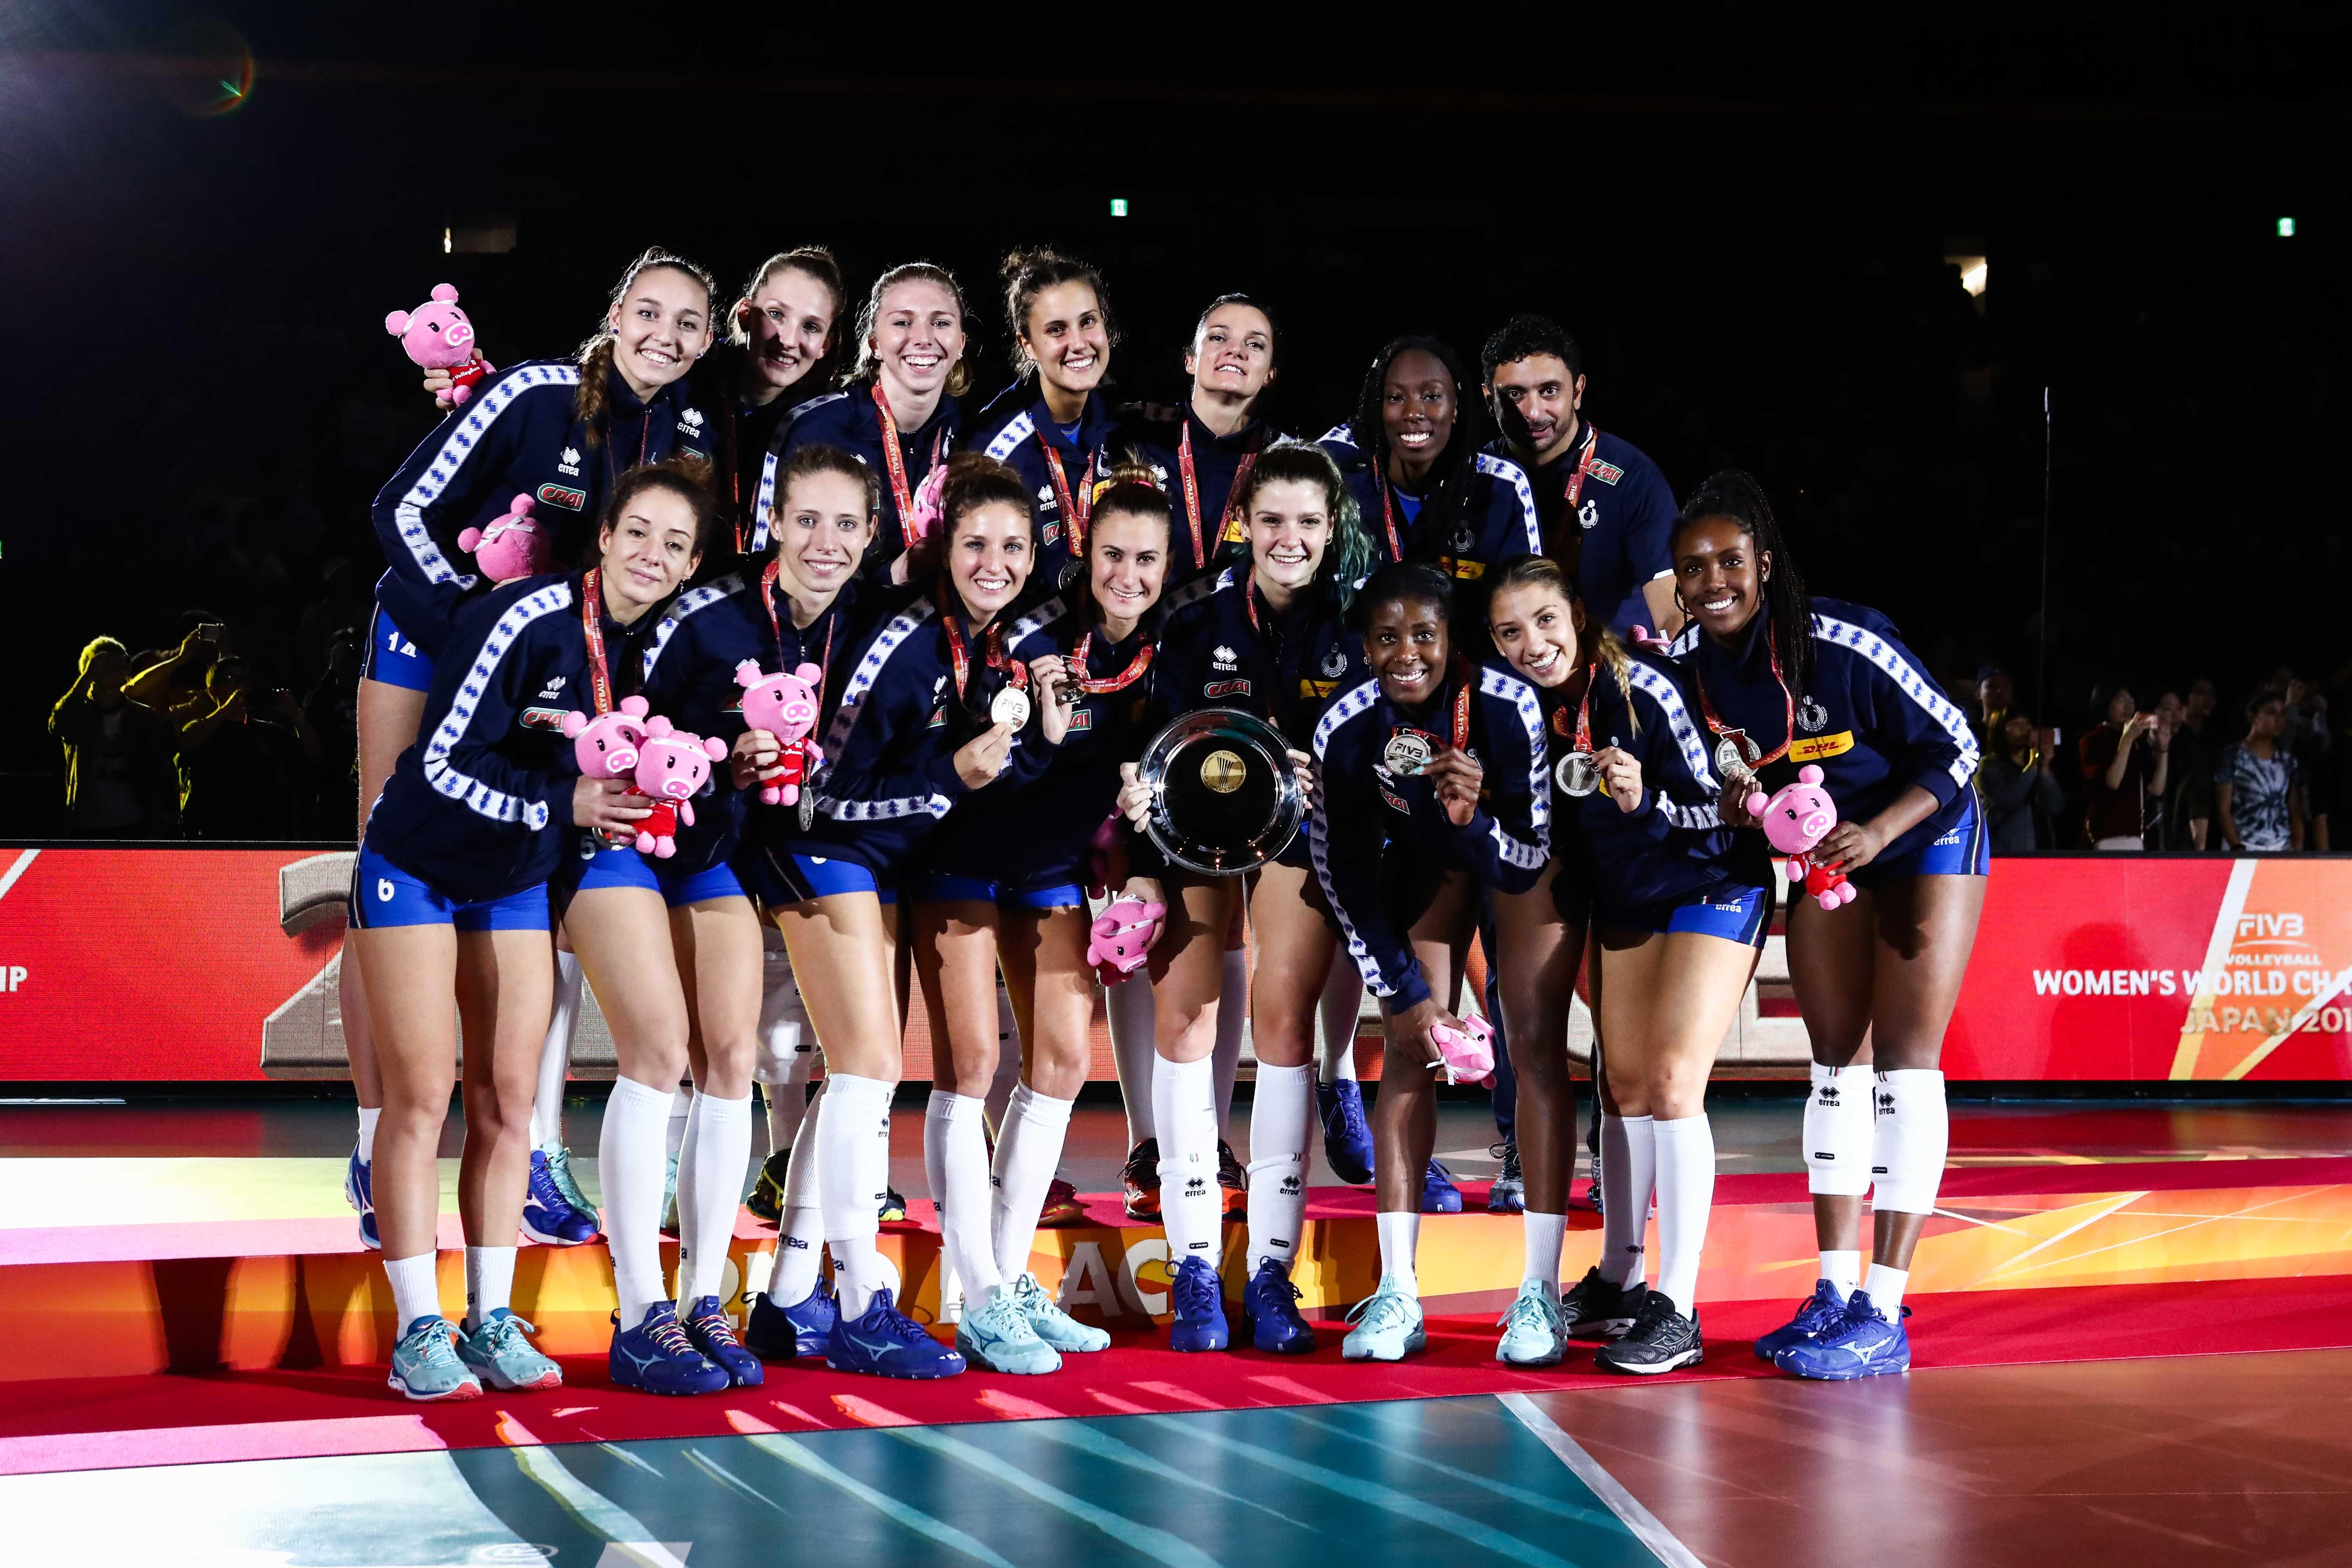 News - World title boosts Serbia in FIVB World Ranking